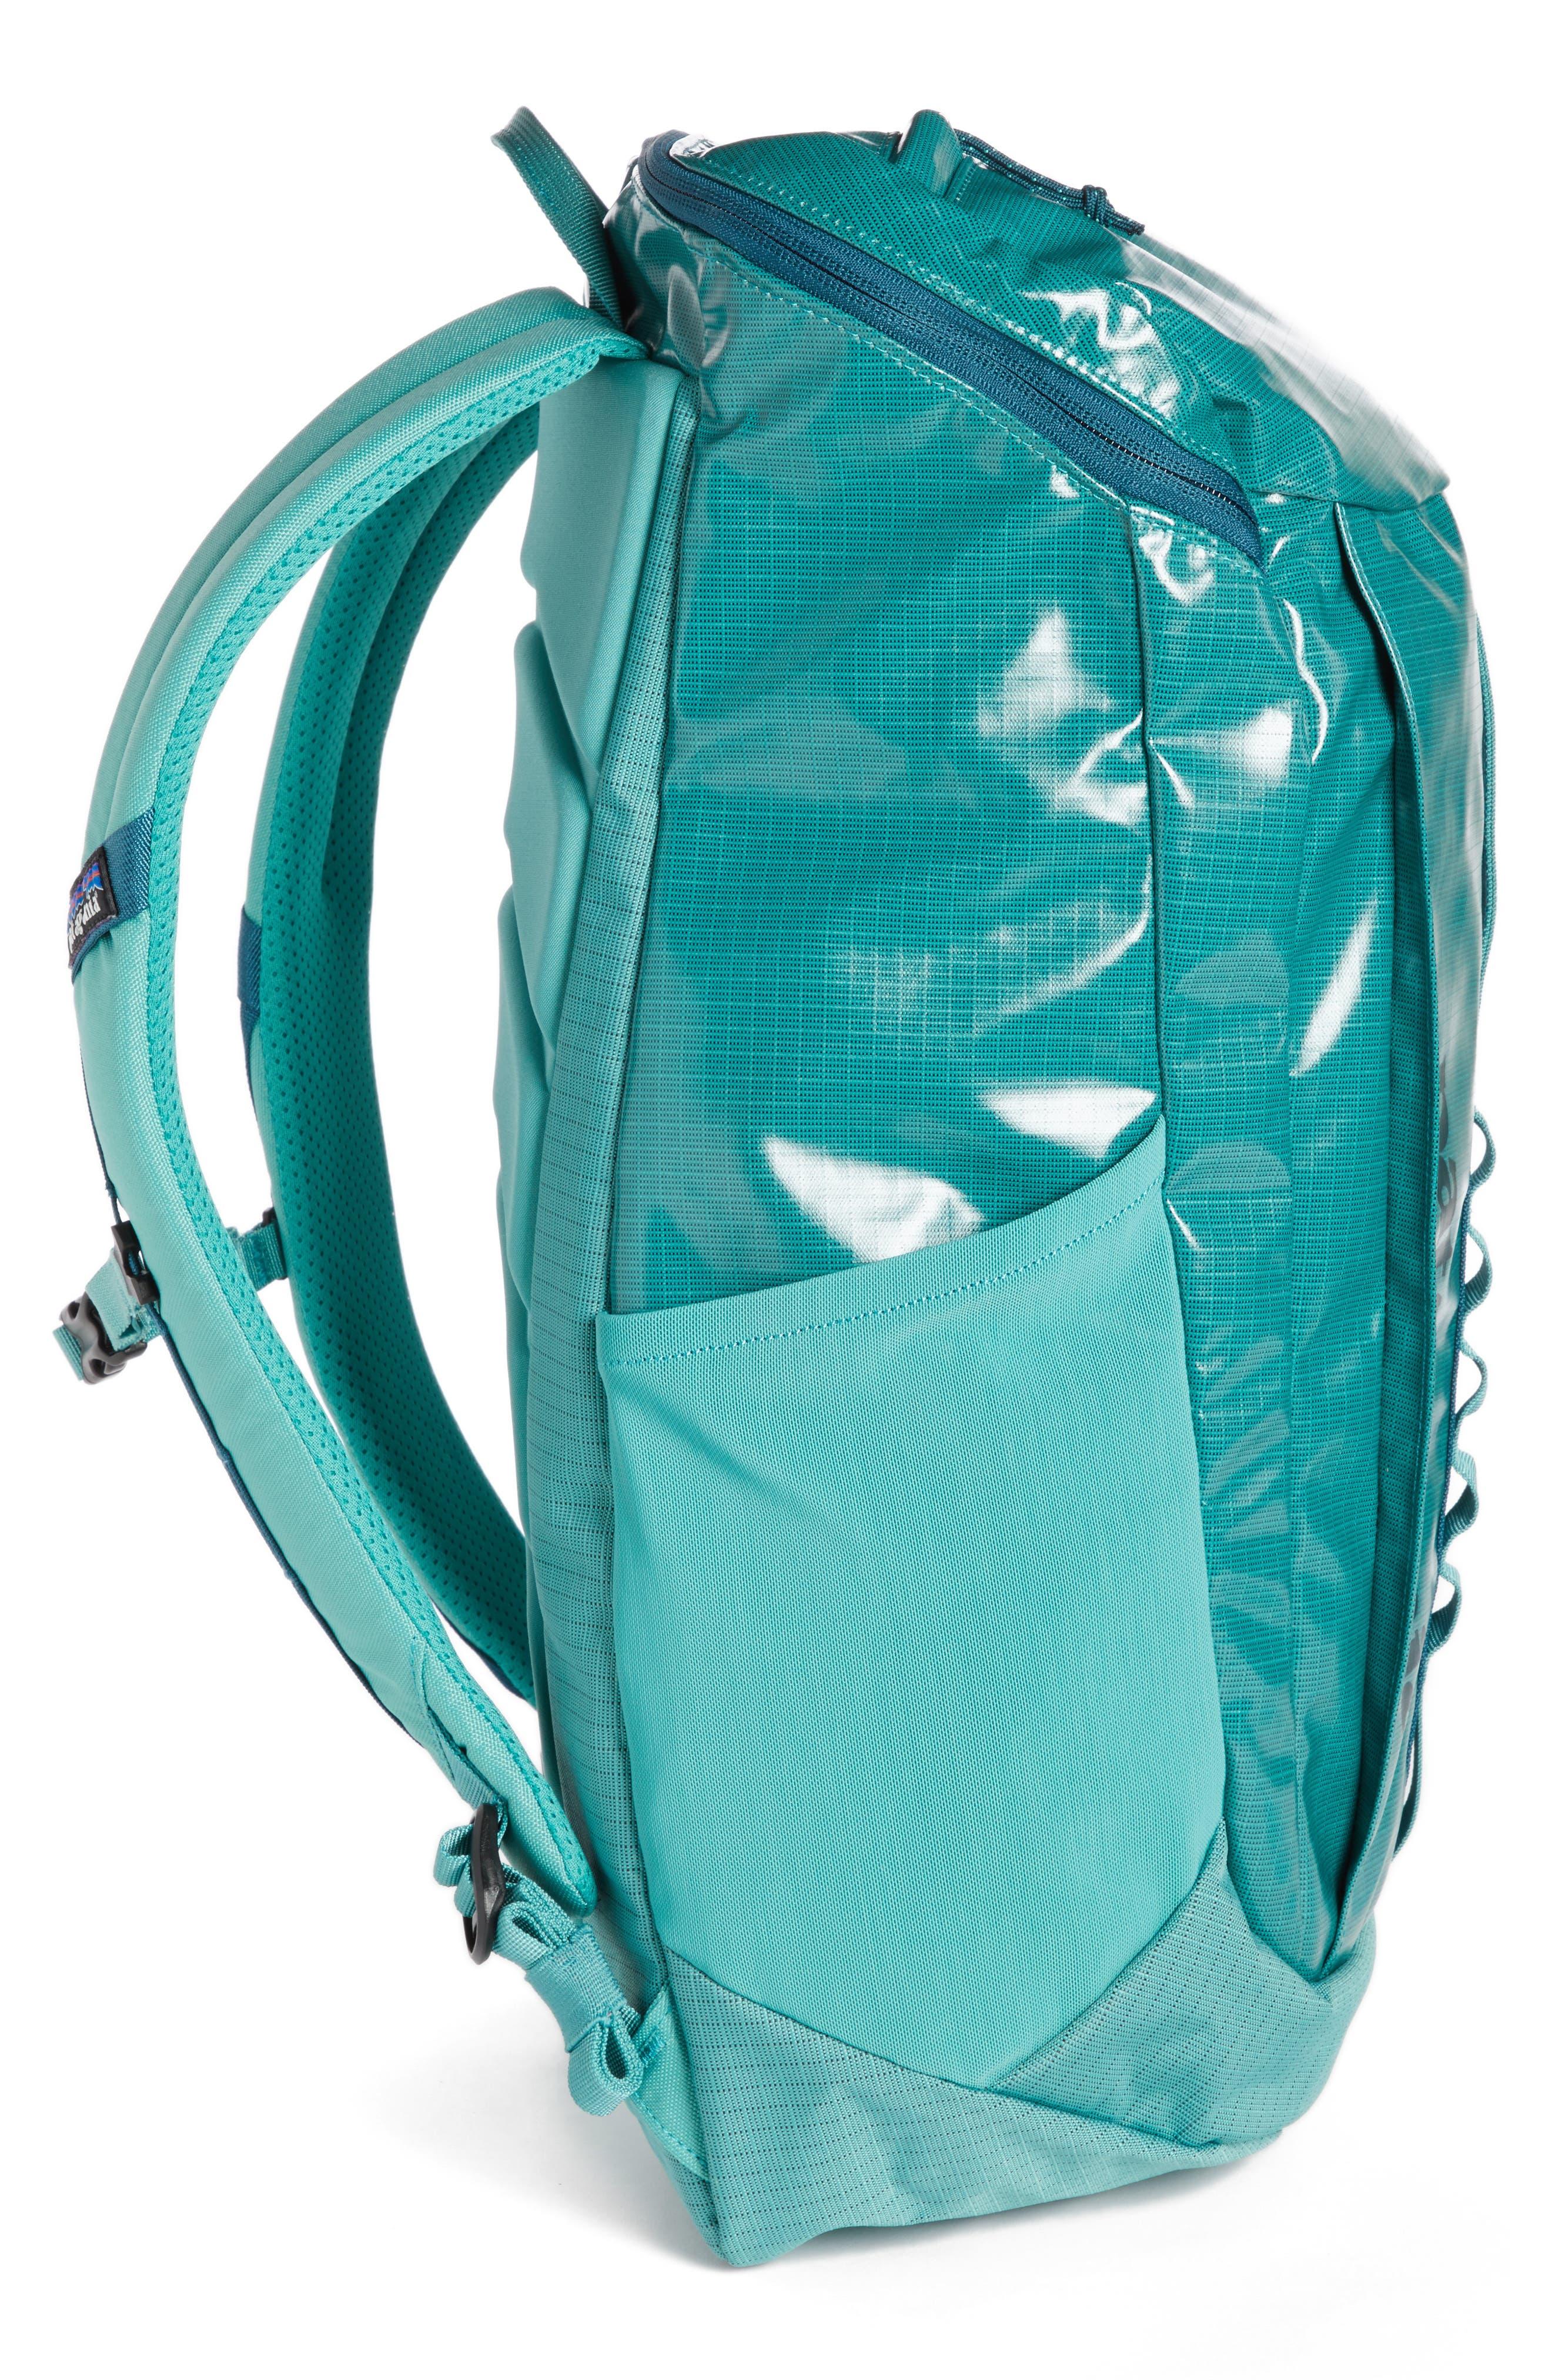 Black Hole 25L Backpack,                             Alternate thumbnail 4, color,                             Beryl Green